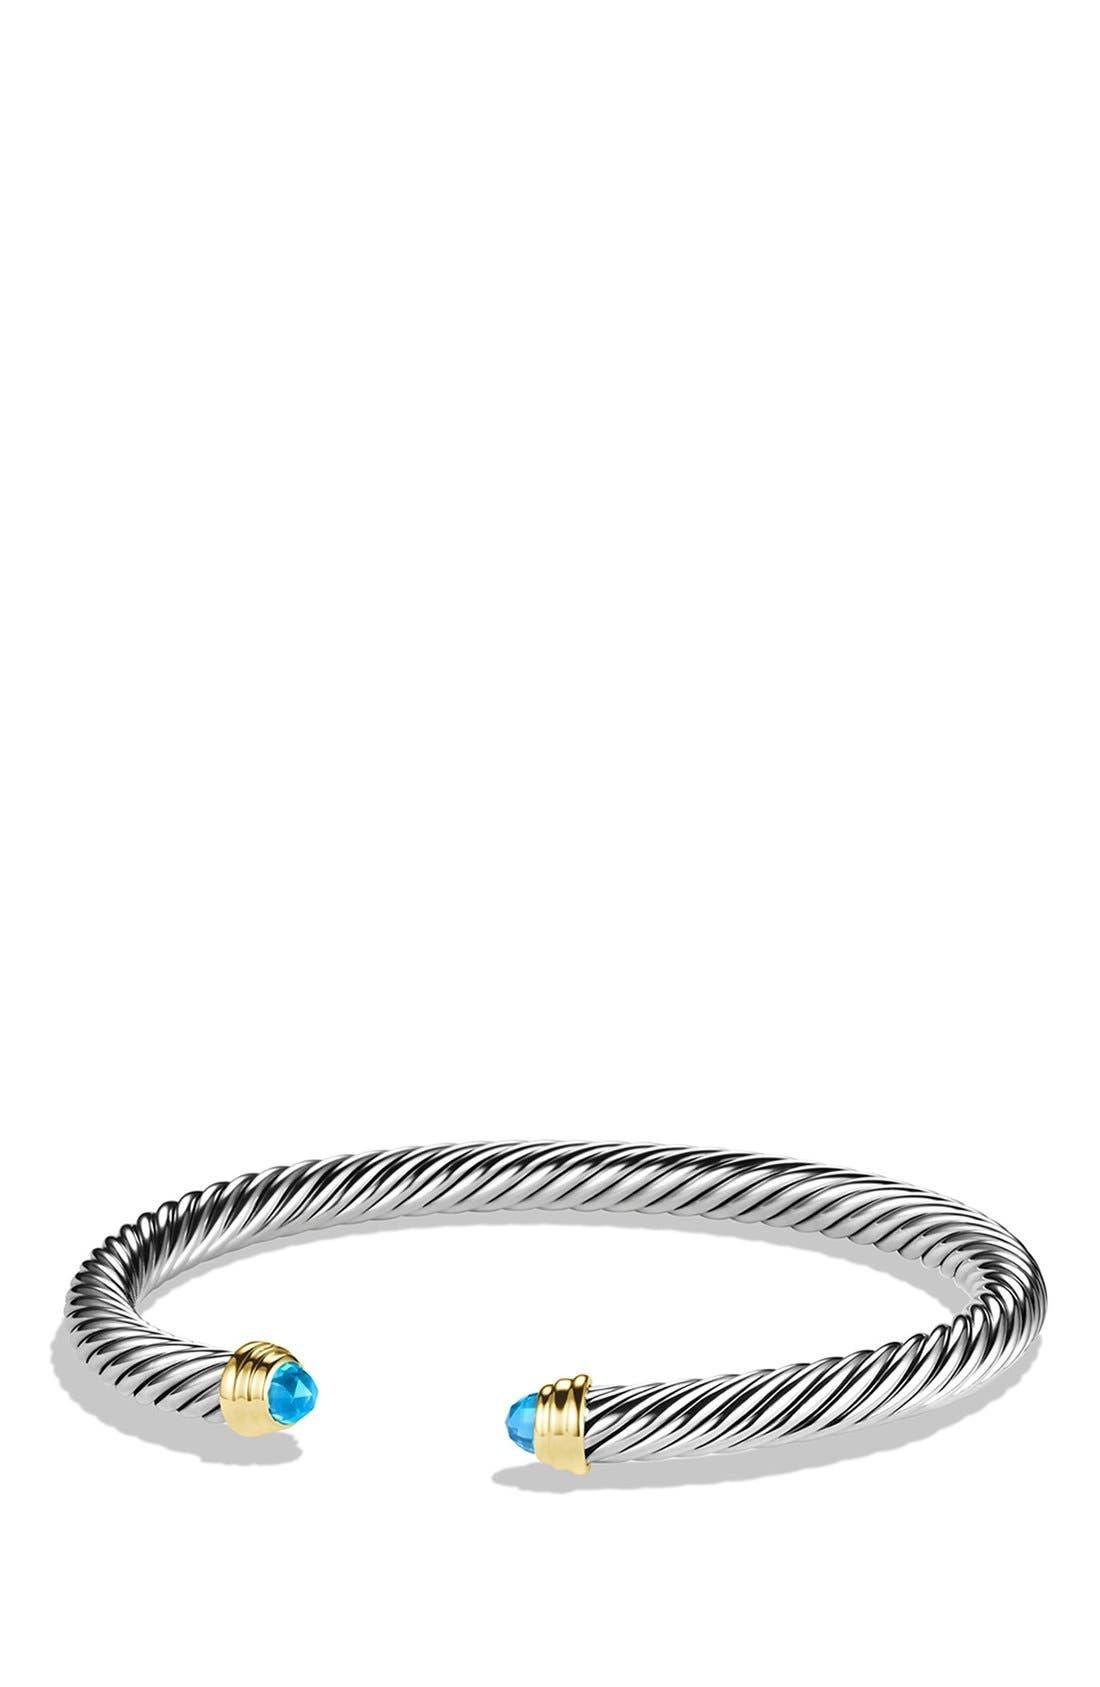 David Yurman 'Cable Classics' Bracelet with Semiprecious Stones & Gold